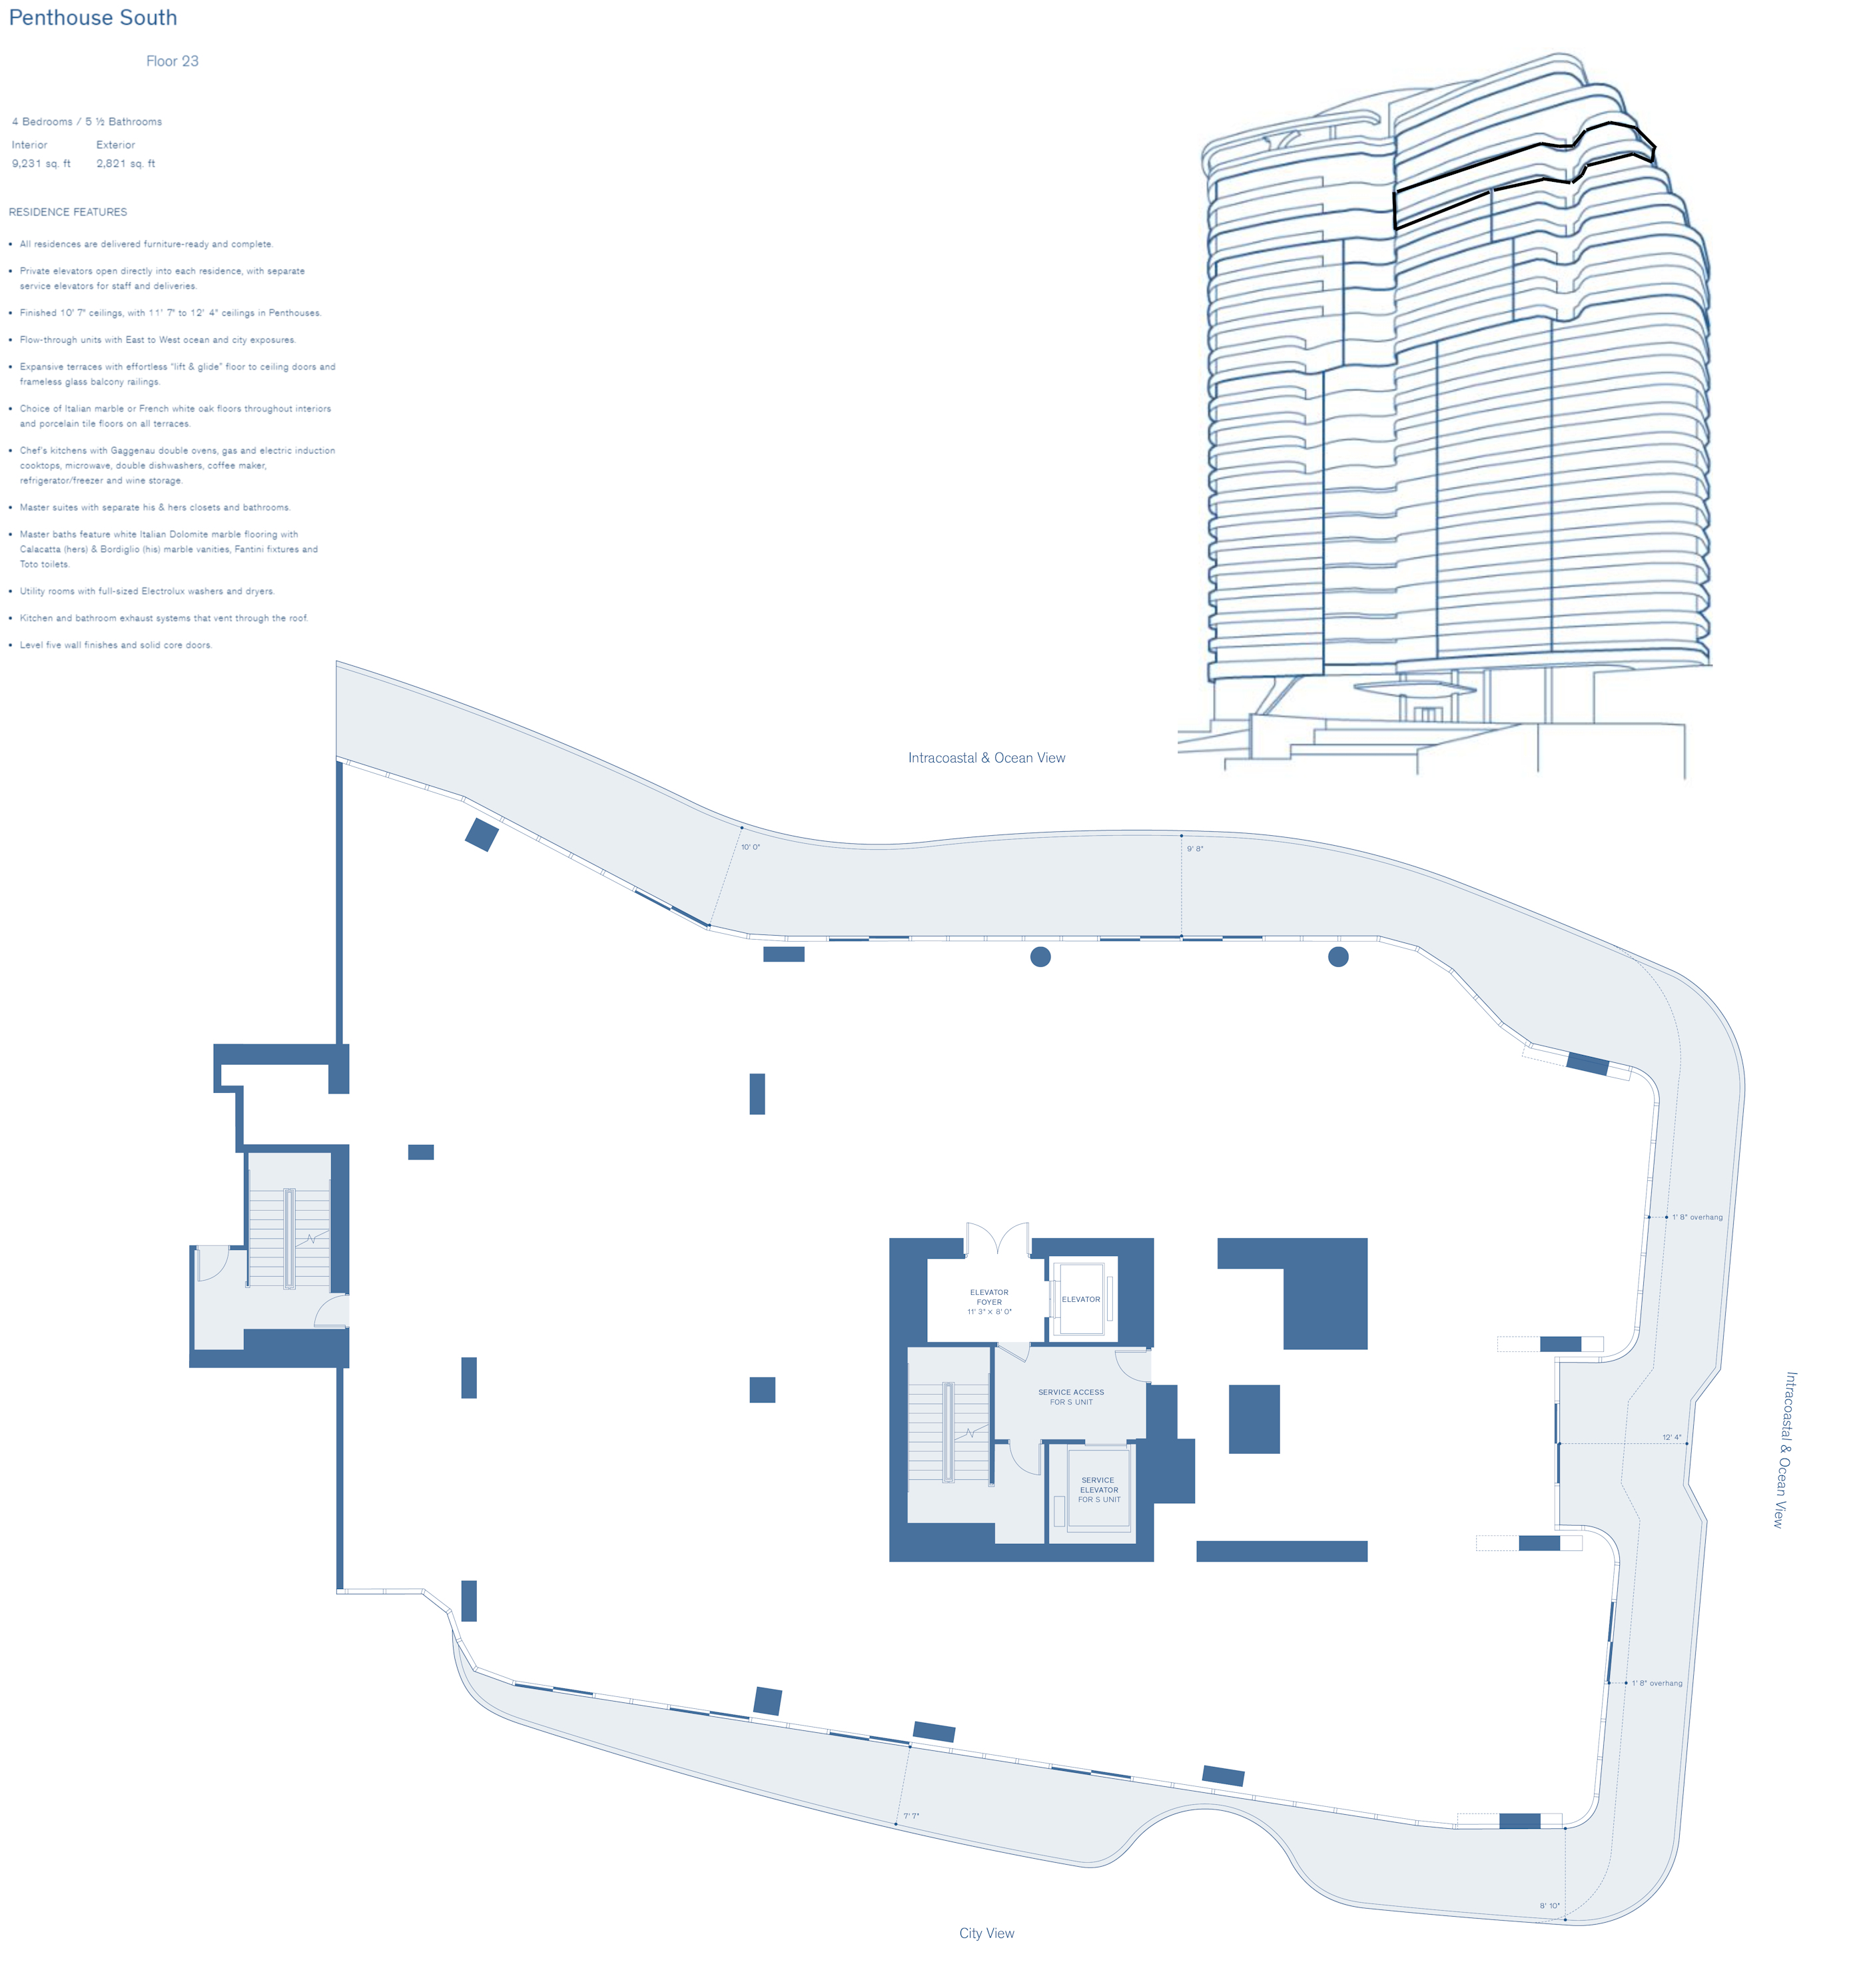 Penthouse South Fl 23